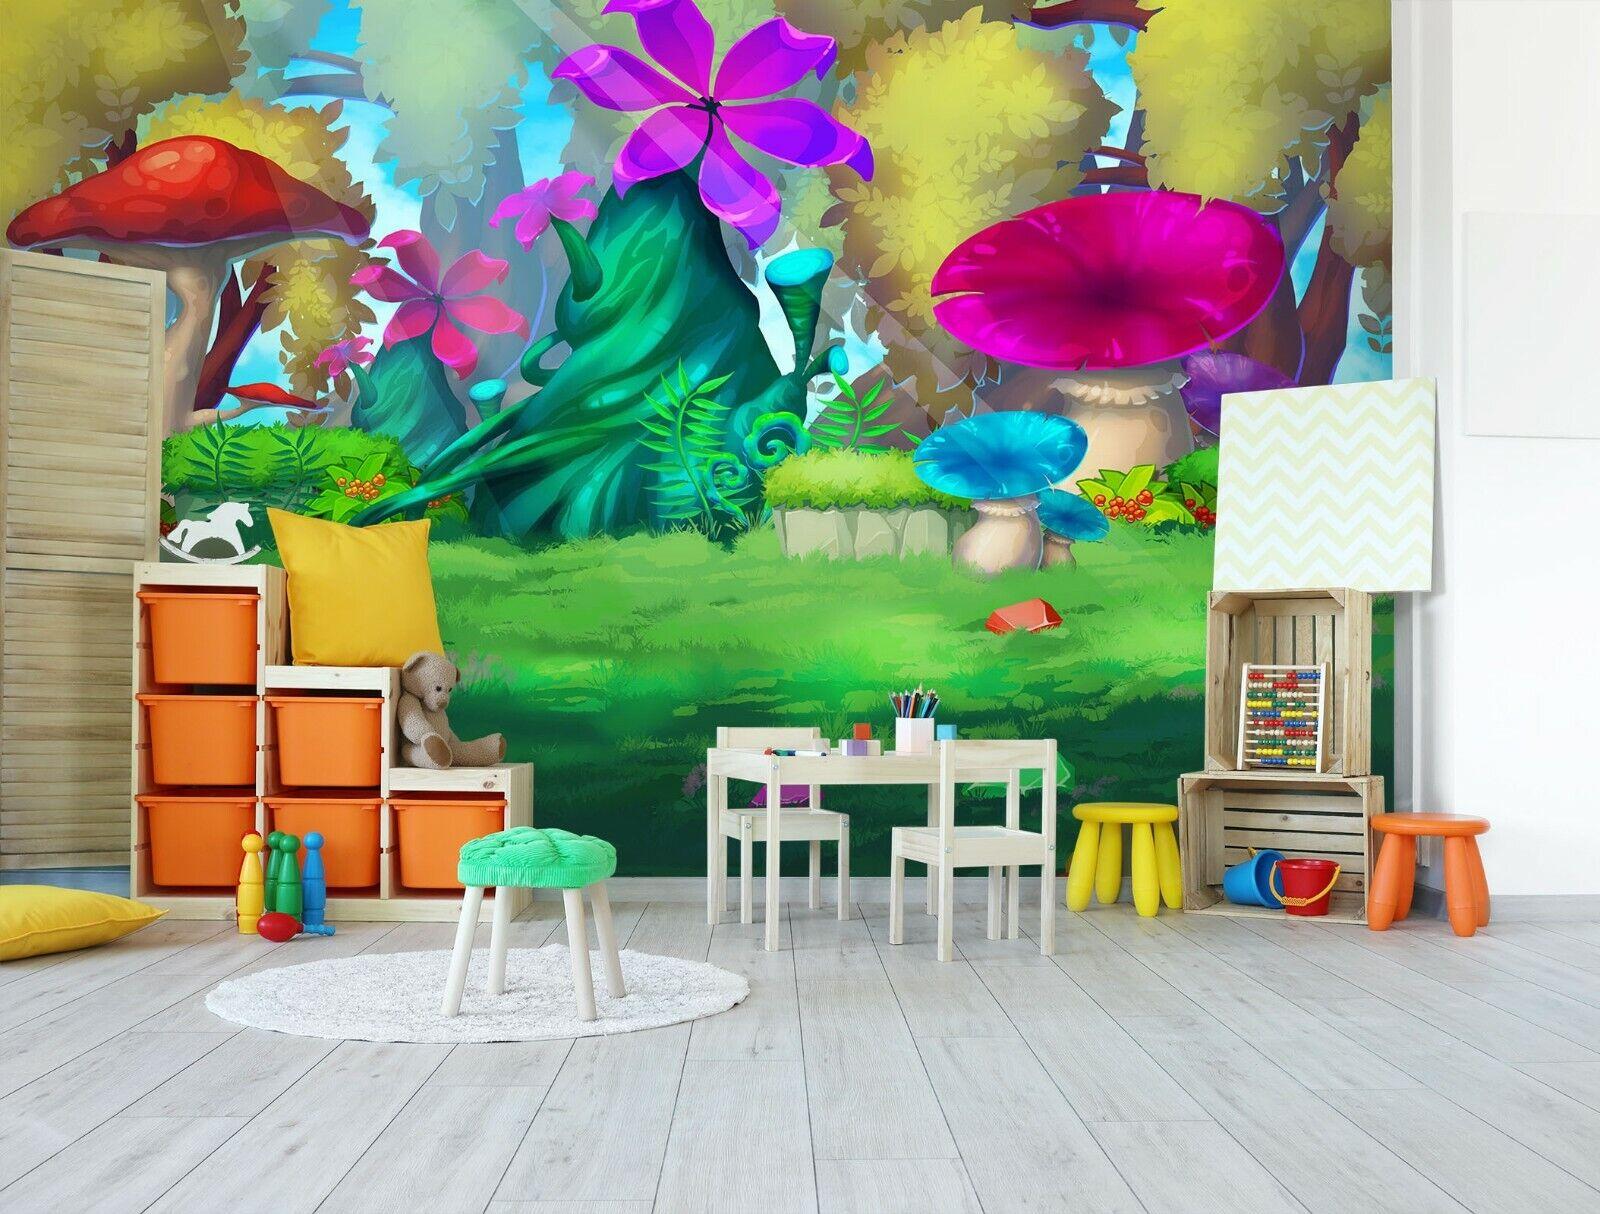 3D Farbige Pilze Kind M926 Geschäft Tapete Wandgemälde Selbstklebend Handel Amy